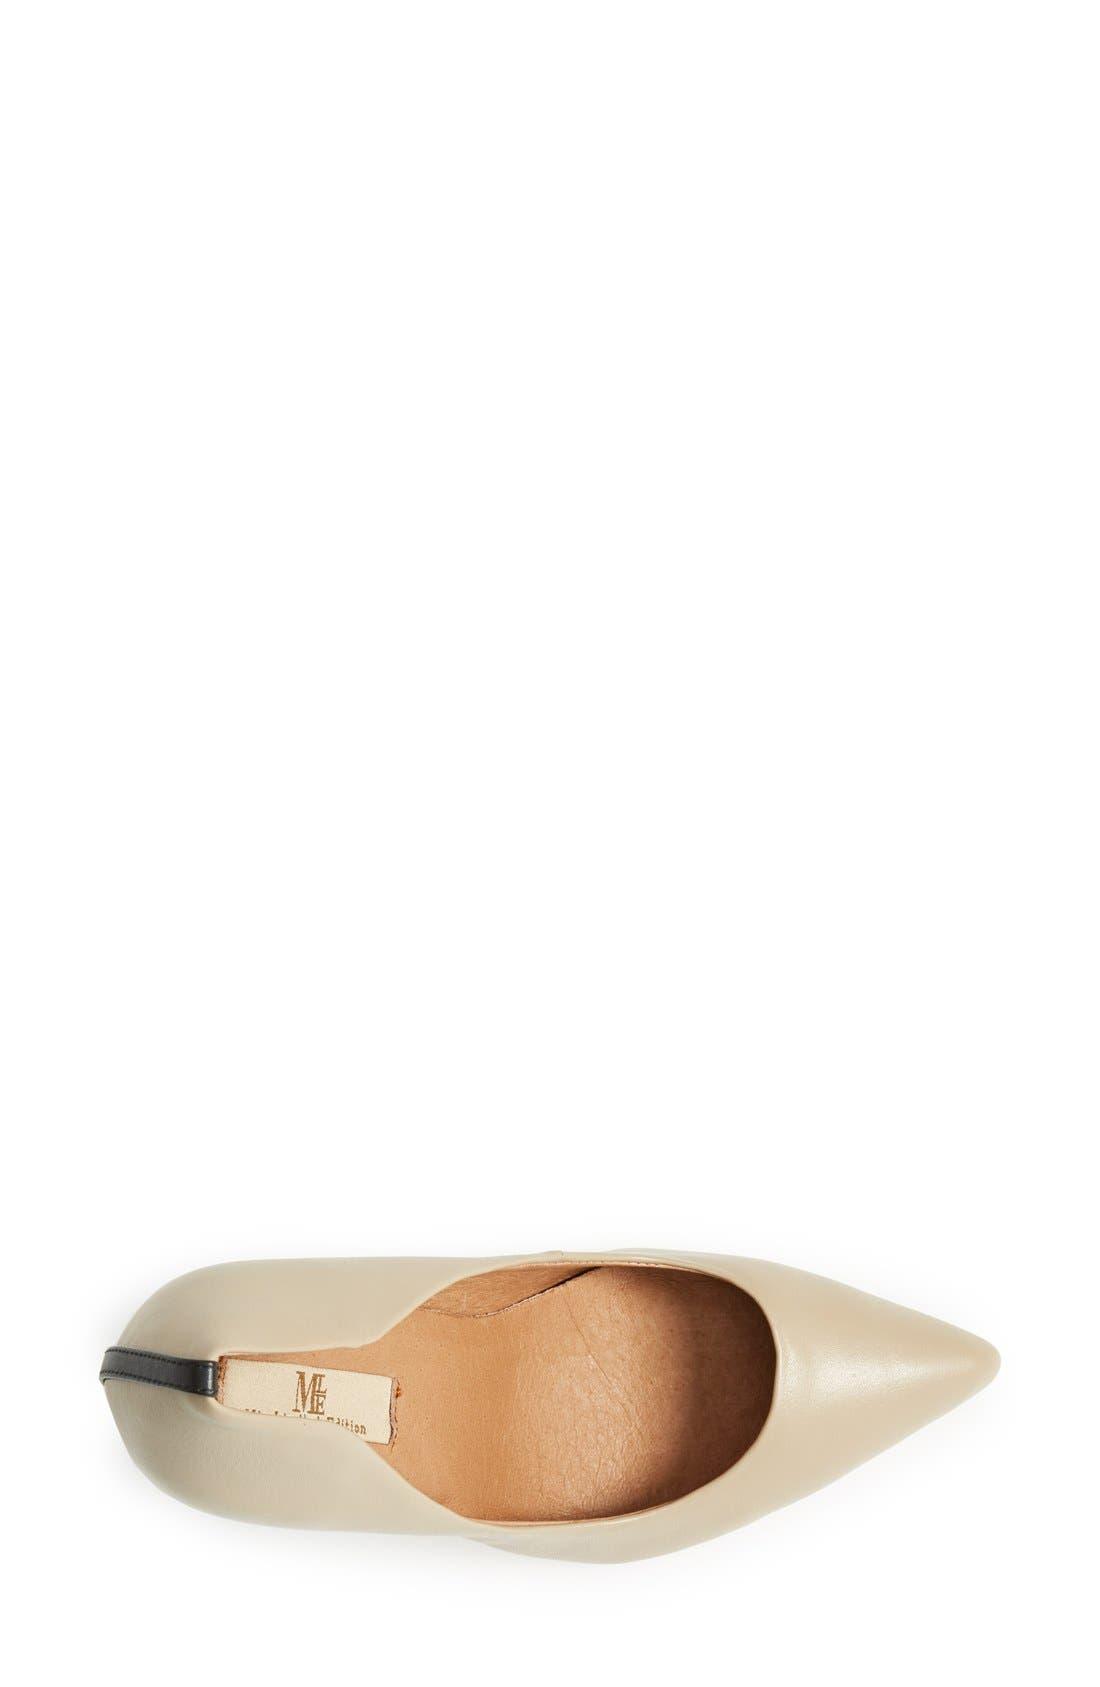 Alternate Image 3  - Mia Limited Edition 'Jolie' Pointy Toe Pump (Women)